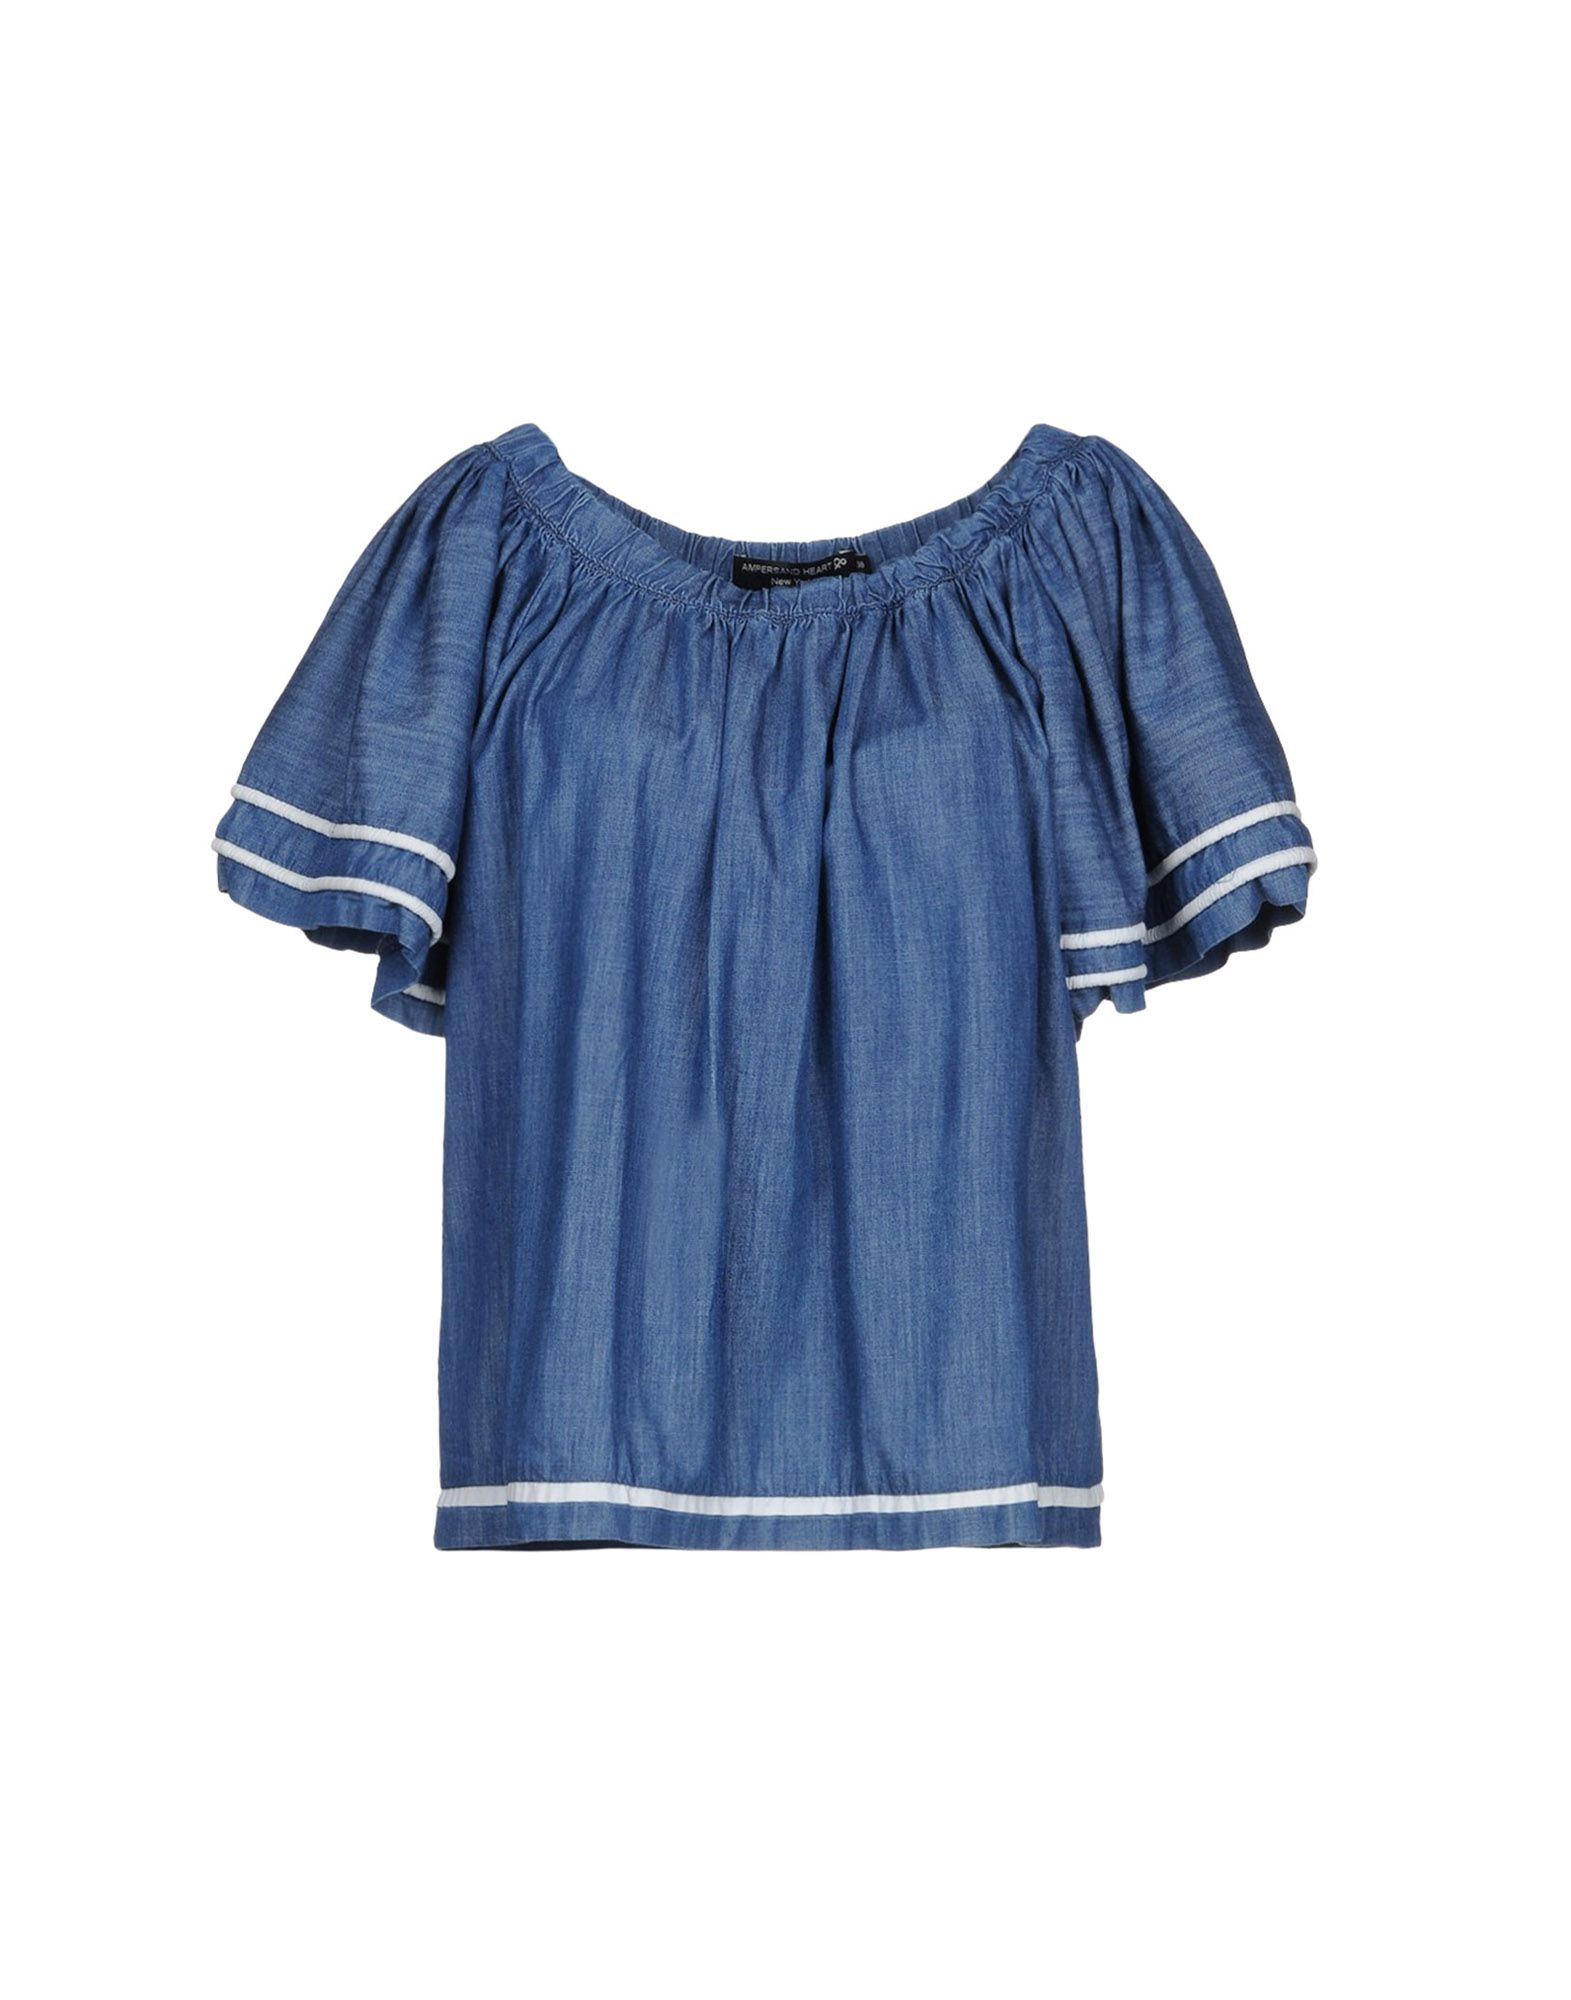 AMPERSAND HEART New York Джинсовая рубашка